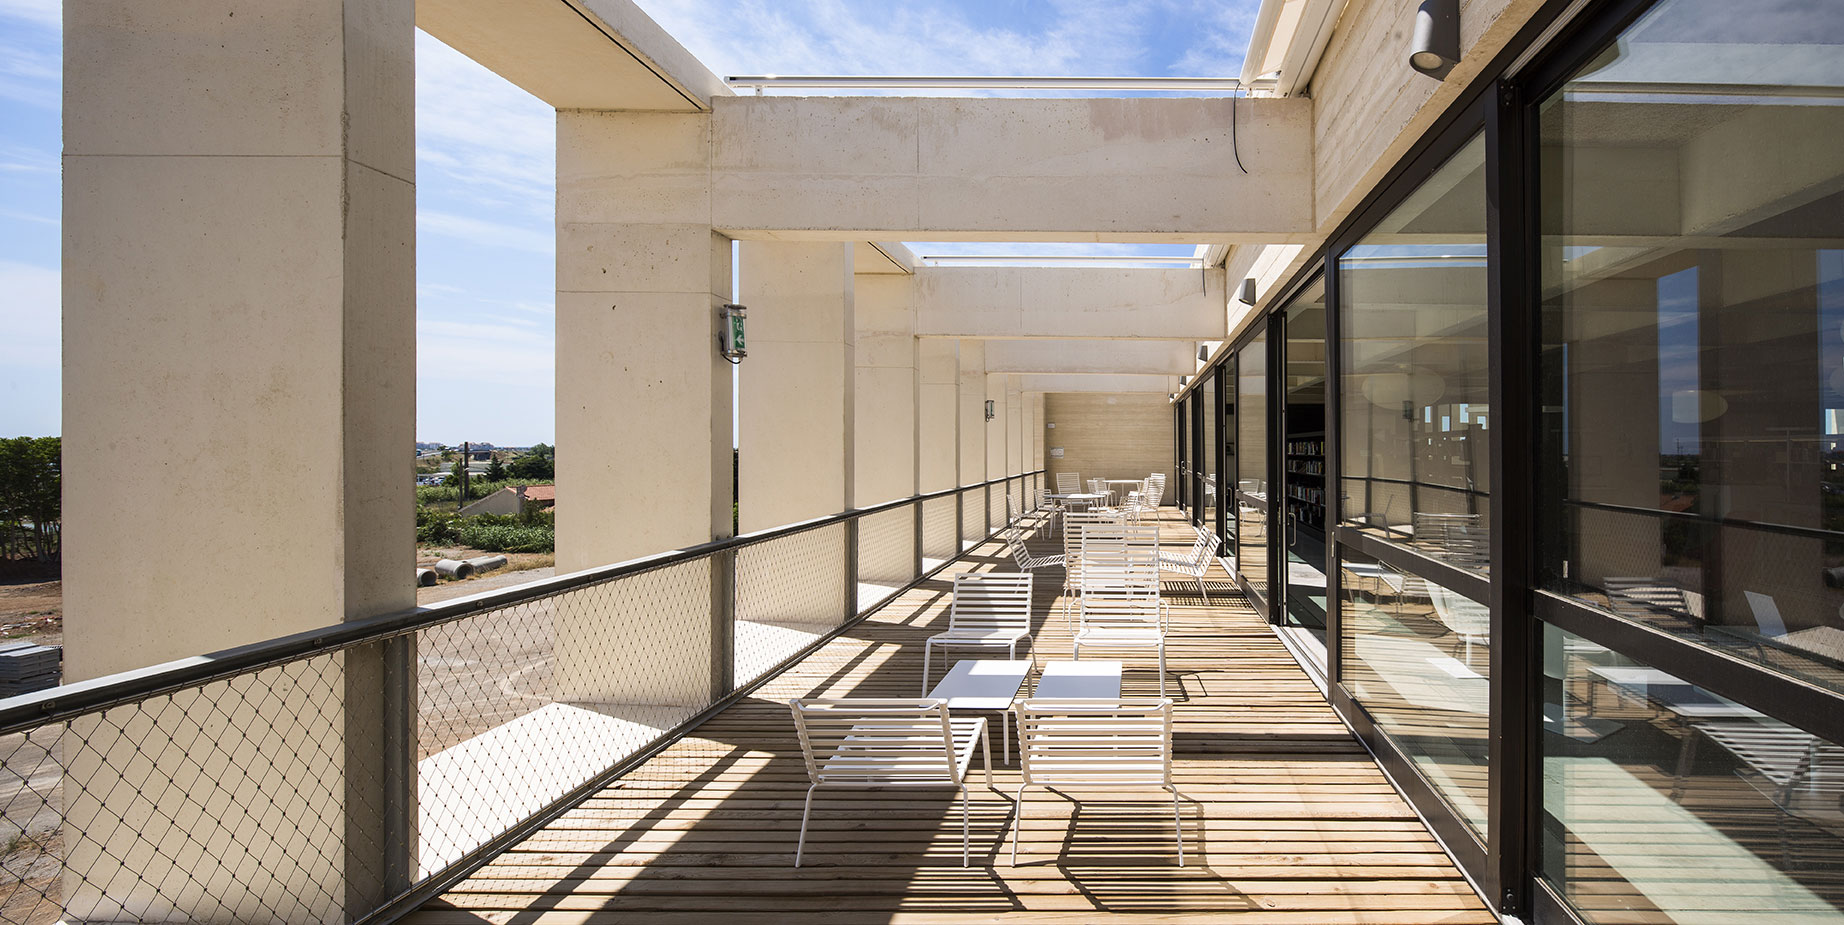 Tautem architecture - mediatheque Montaigne Frontignan - terrasse de lecture